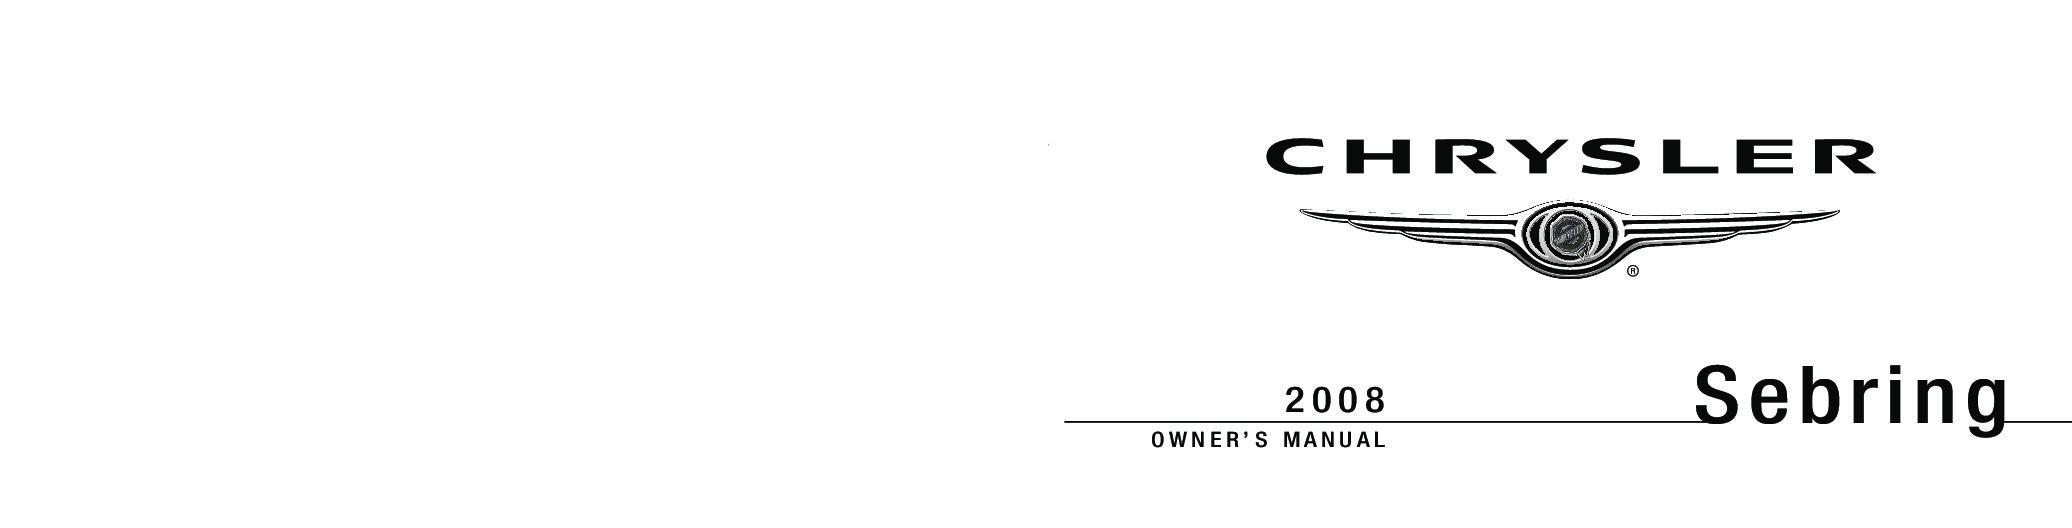 2002 chrysler sebring owners manual